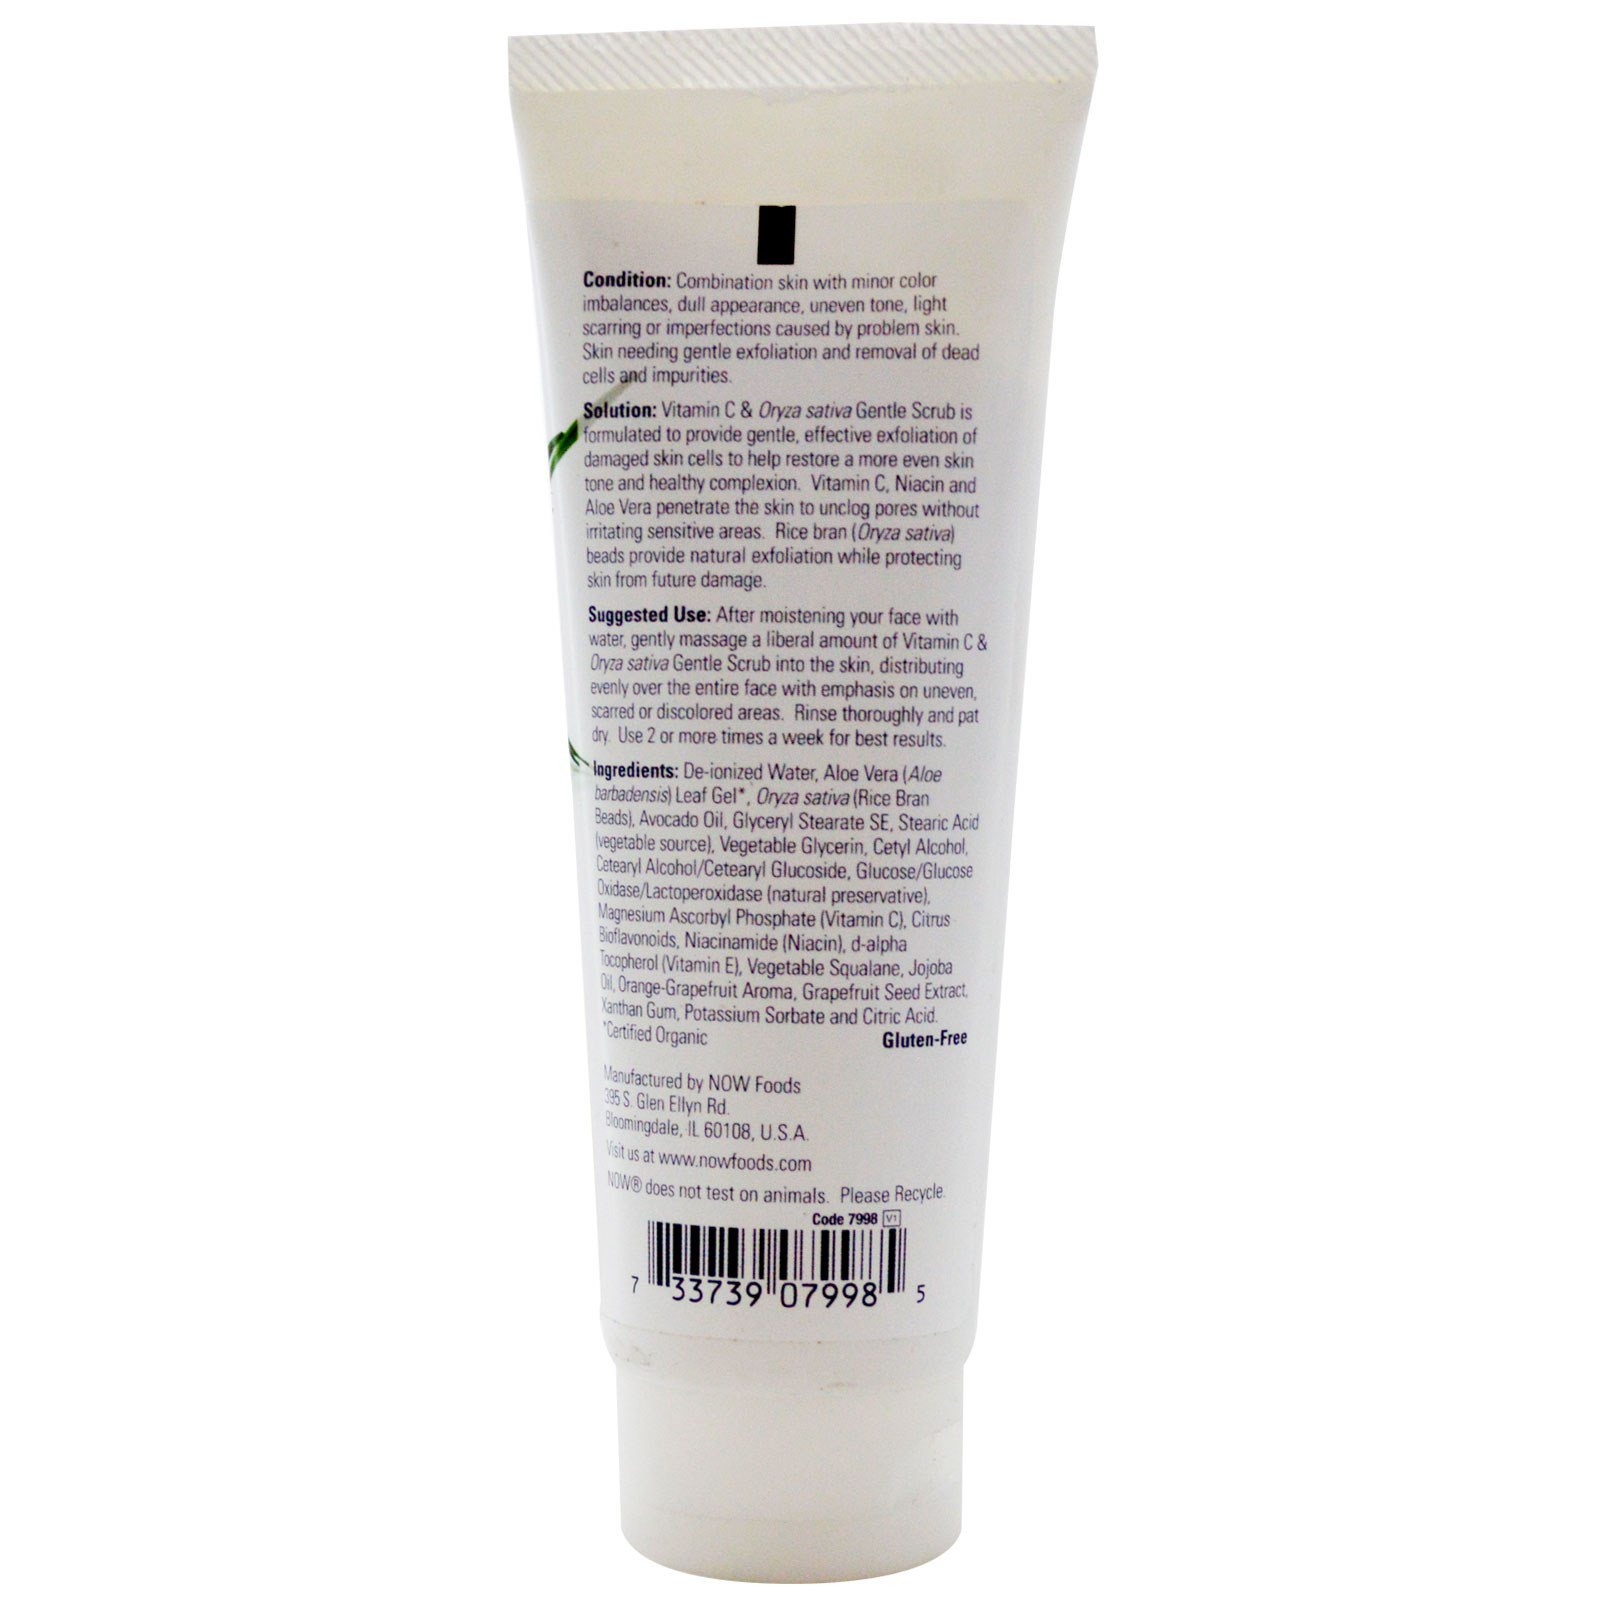 Now Foods Vitamin C & Oryza Sativa Gentle Scrub 4 oz, Pack of 2 HydroPeptide Purifying Facial Mask, 1 fl. oz.